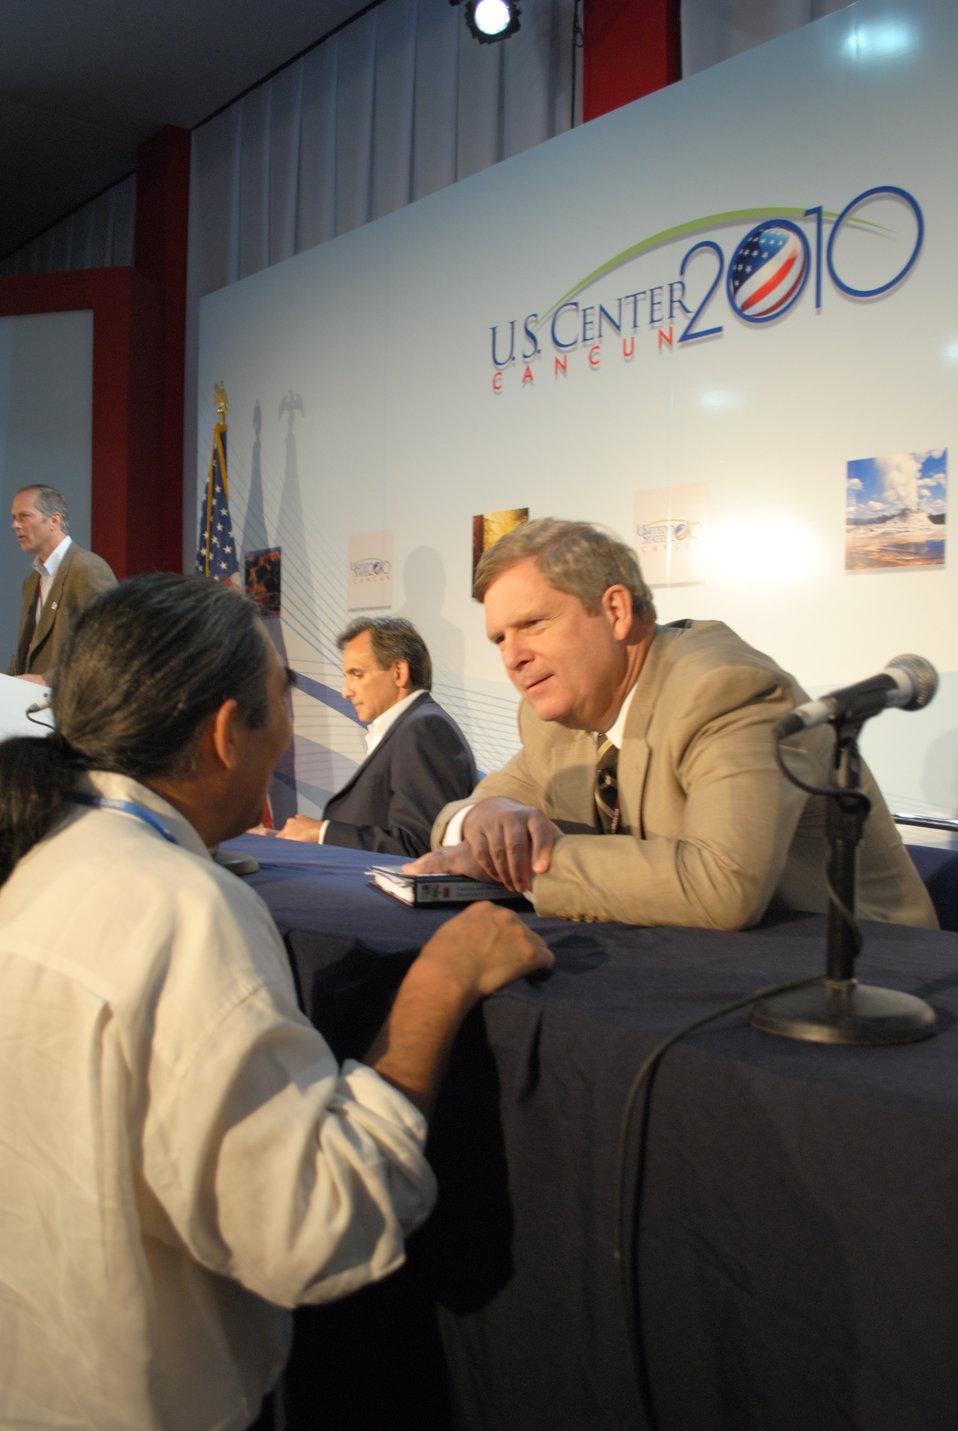 Secretary Vilsack Speaks With a Member of the Audience